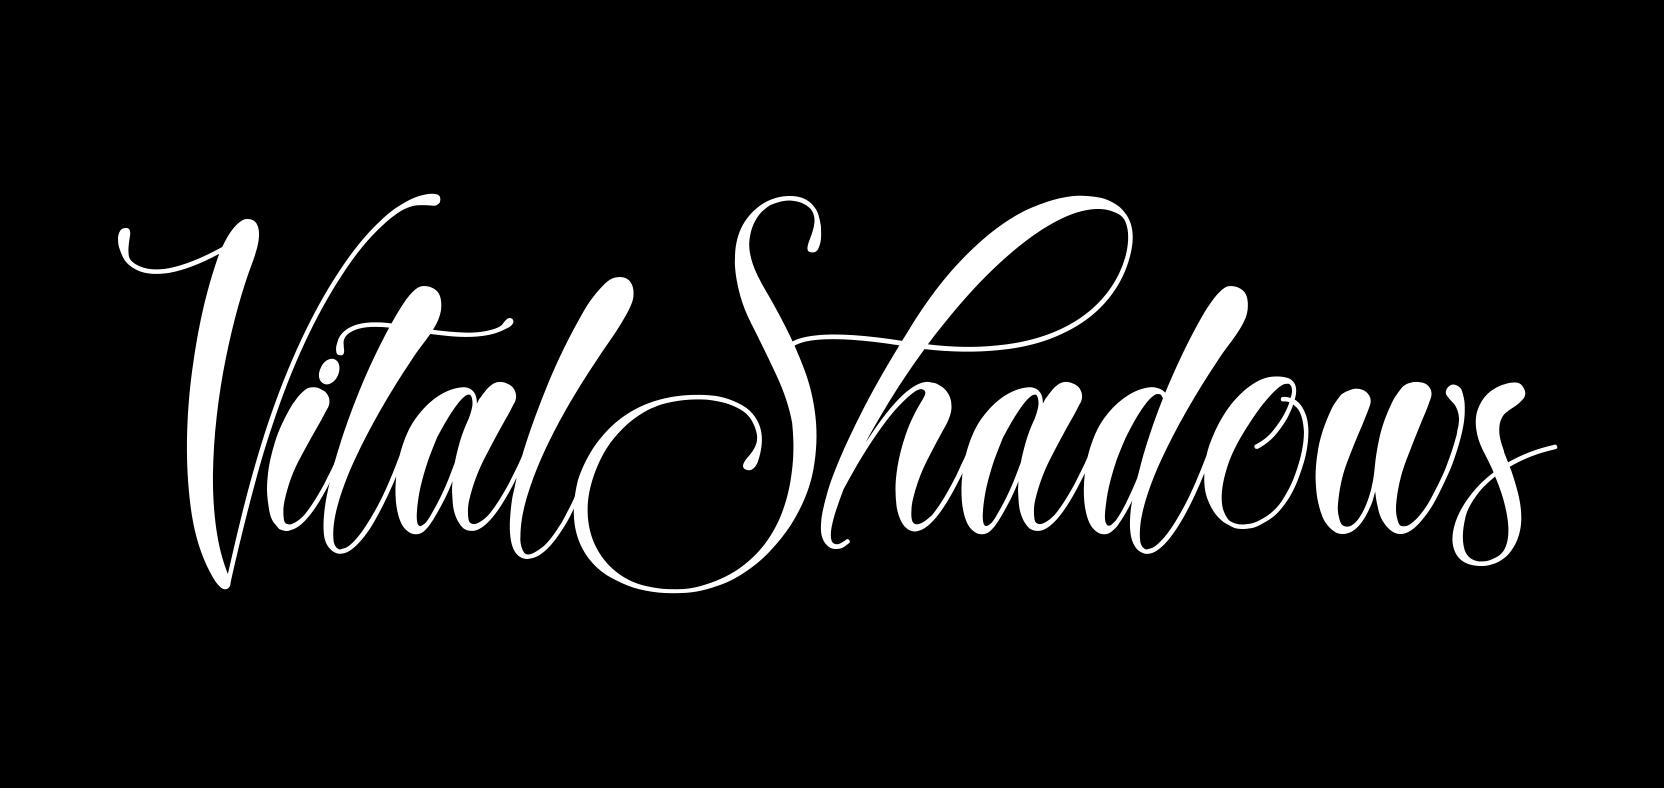 Vital Shadows Beats For Sale - Hip Hop, Rap, Trap, Instrumental